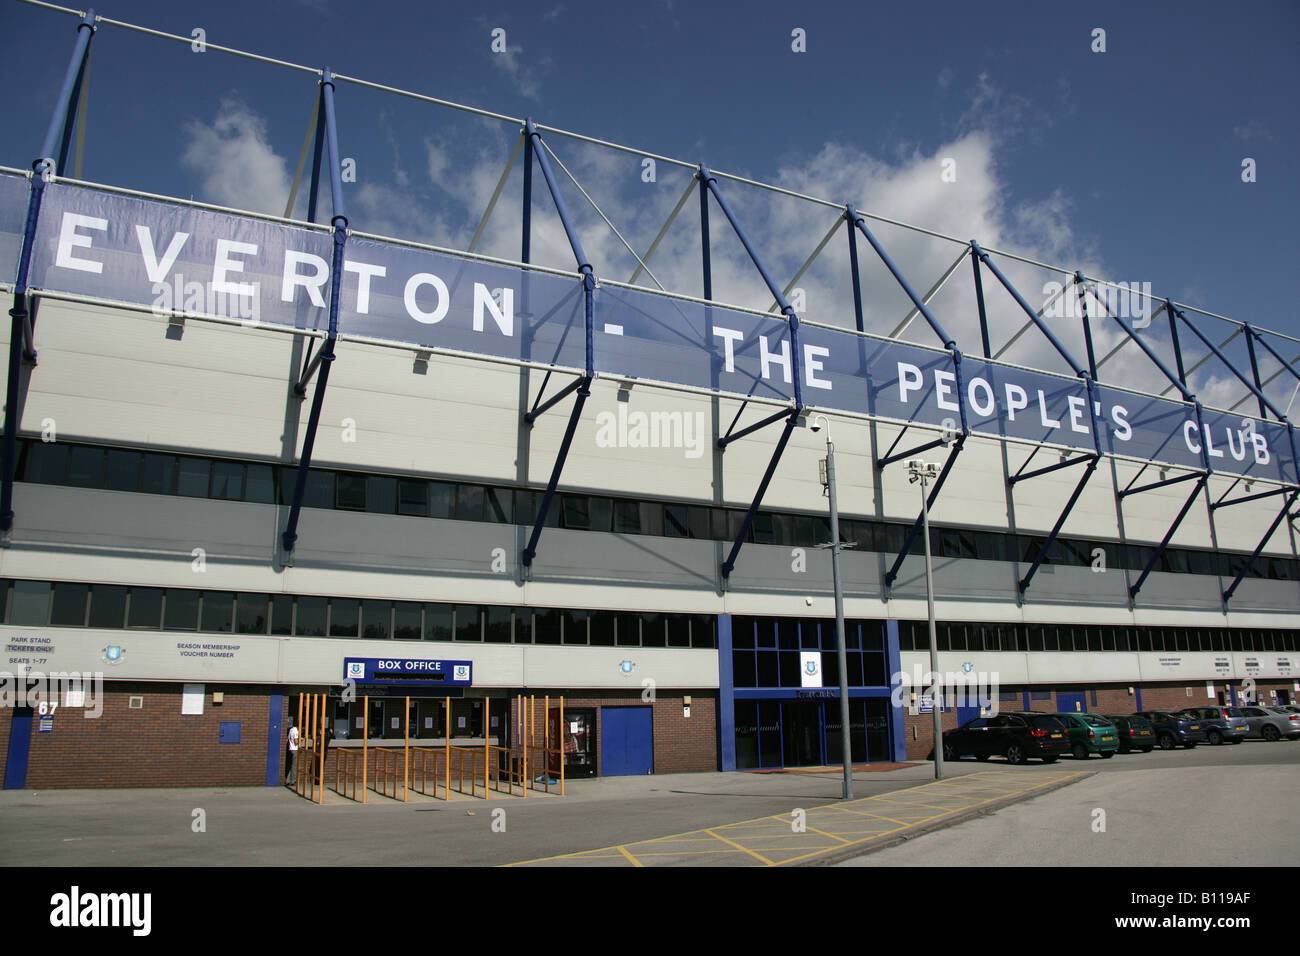 City of Liverpool, England. Main stadium entrance to Goodison Park, home of Everton Football Club. Stock Photo